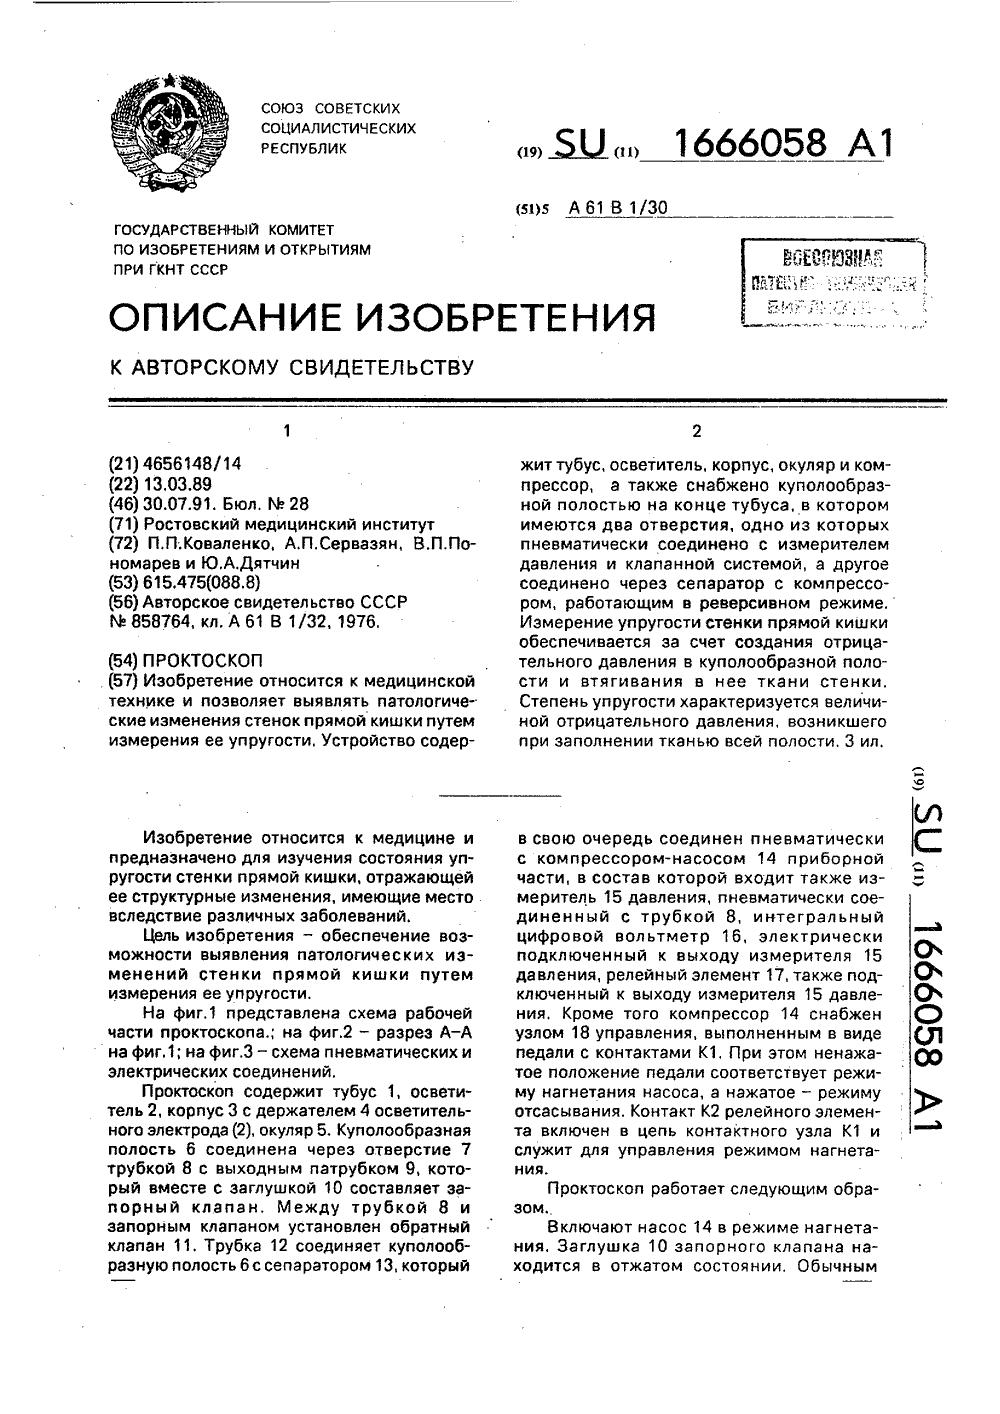 Проктоскоп фото